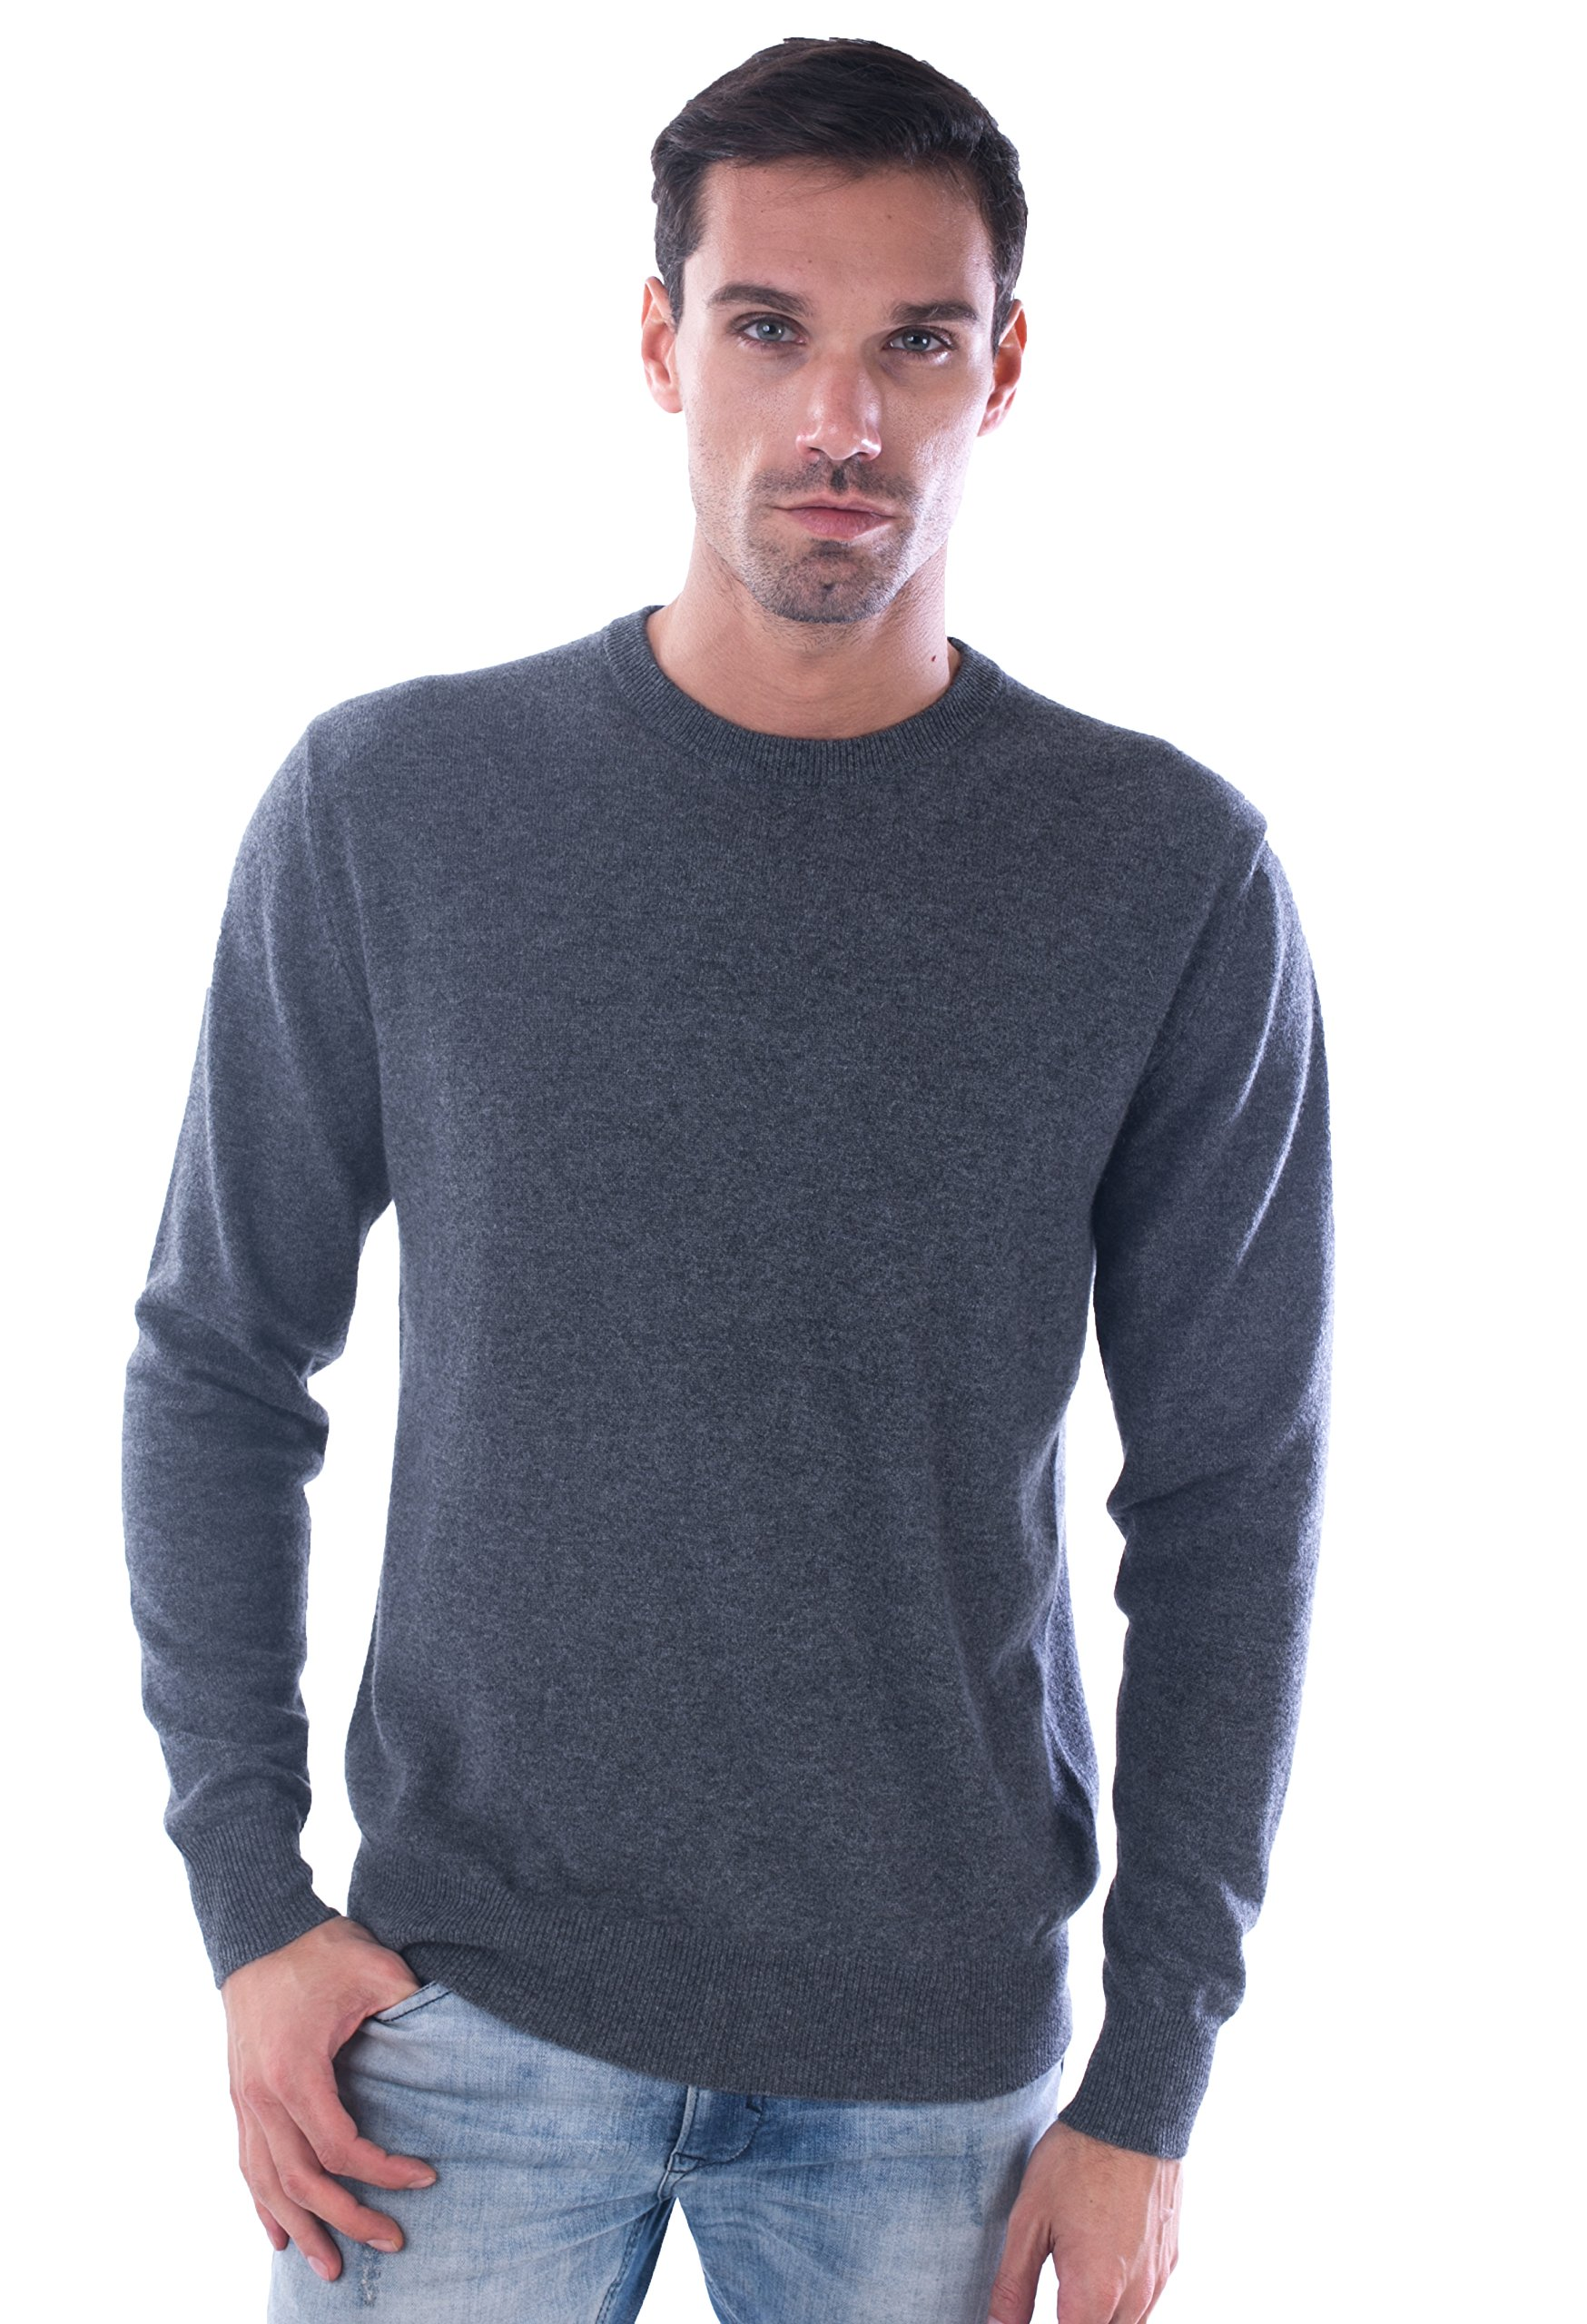 LEBAC Men's 100% Cashmere Round Neck Sweater by LEBAC